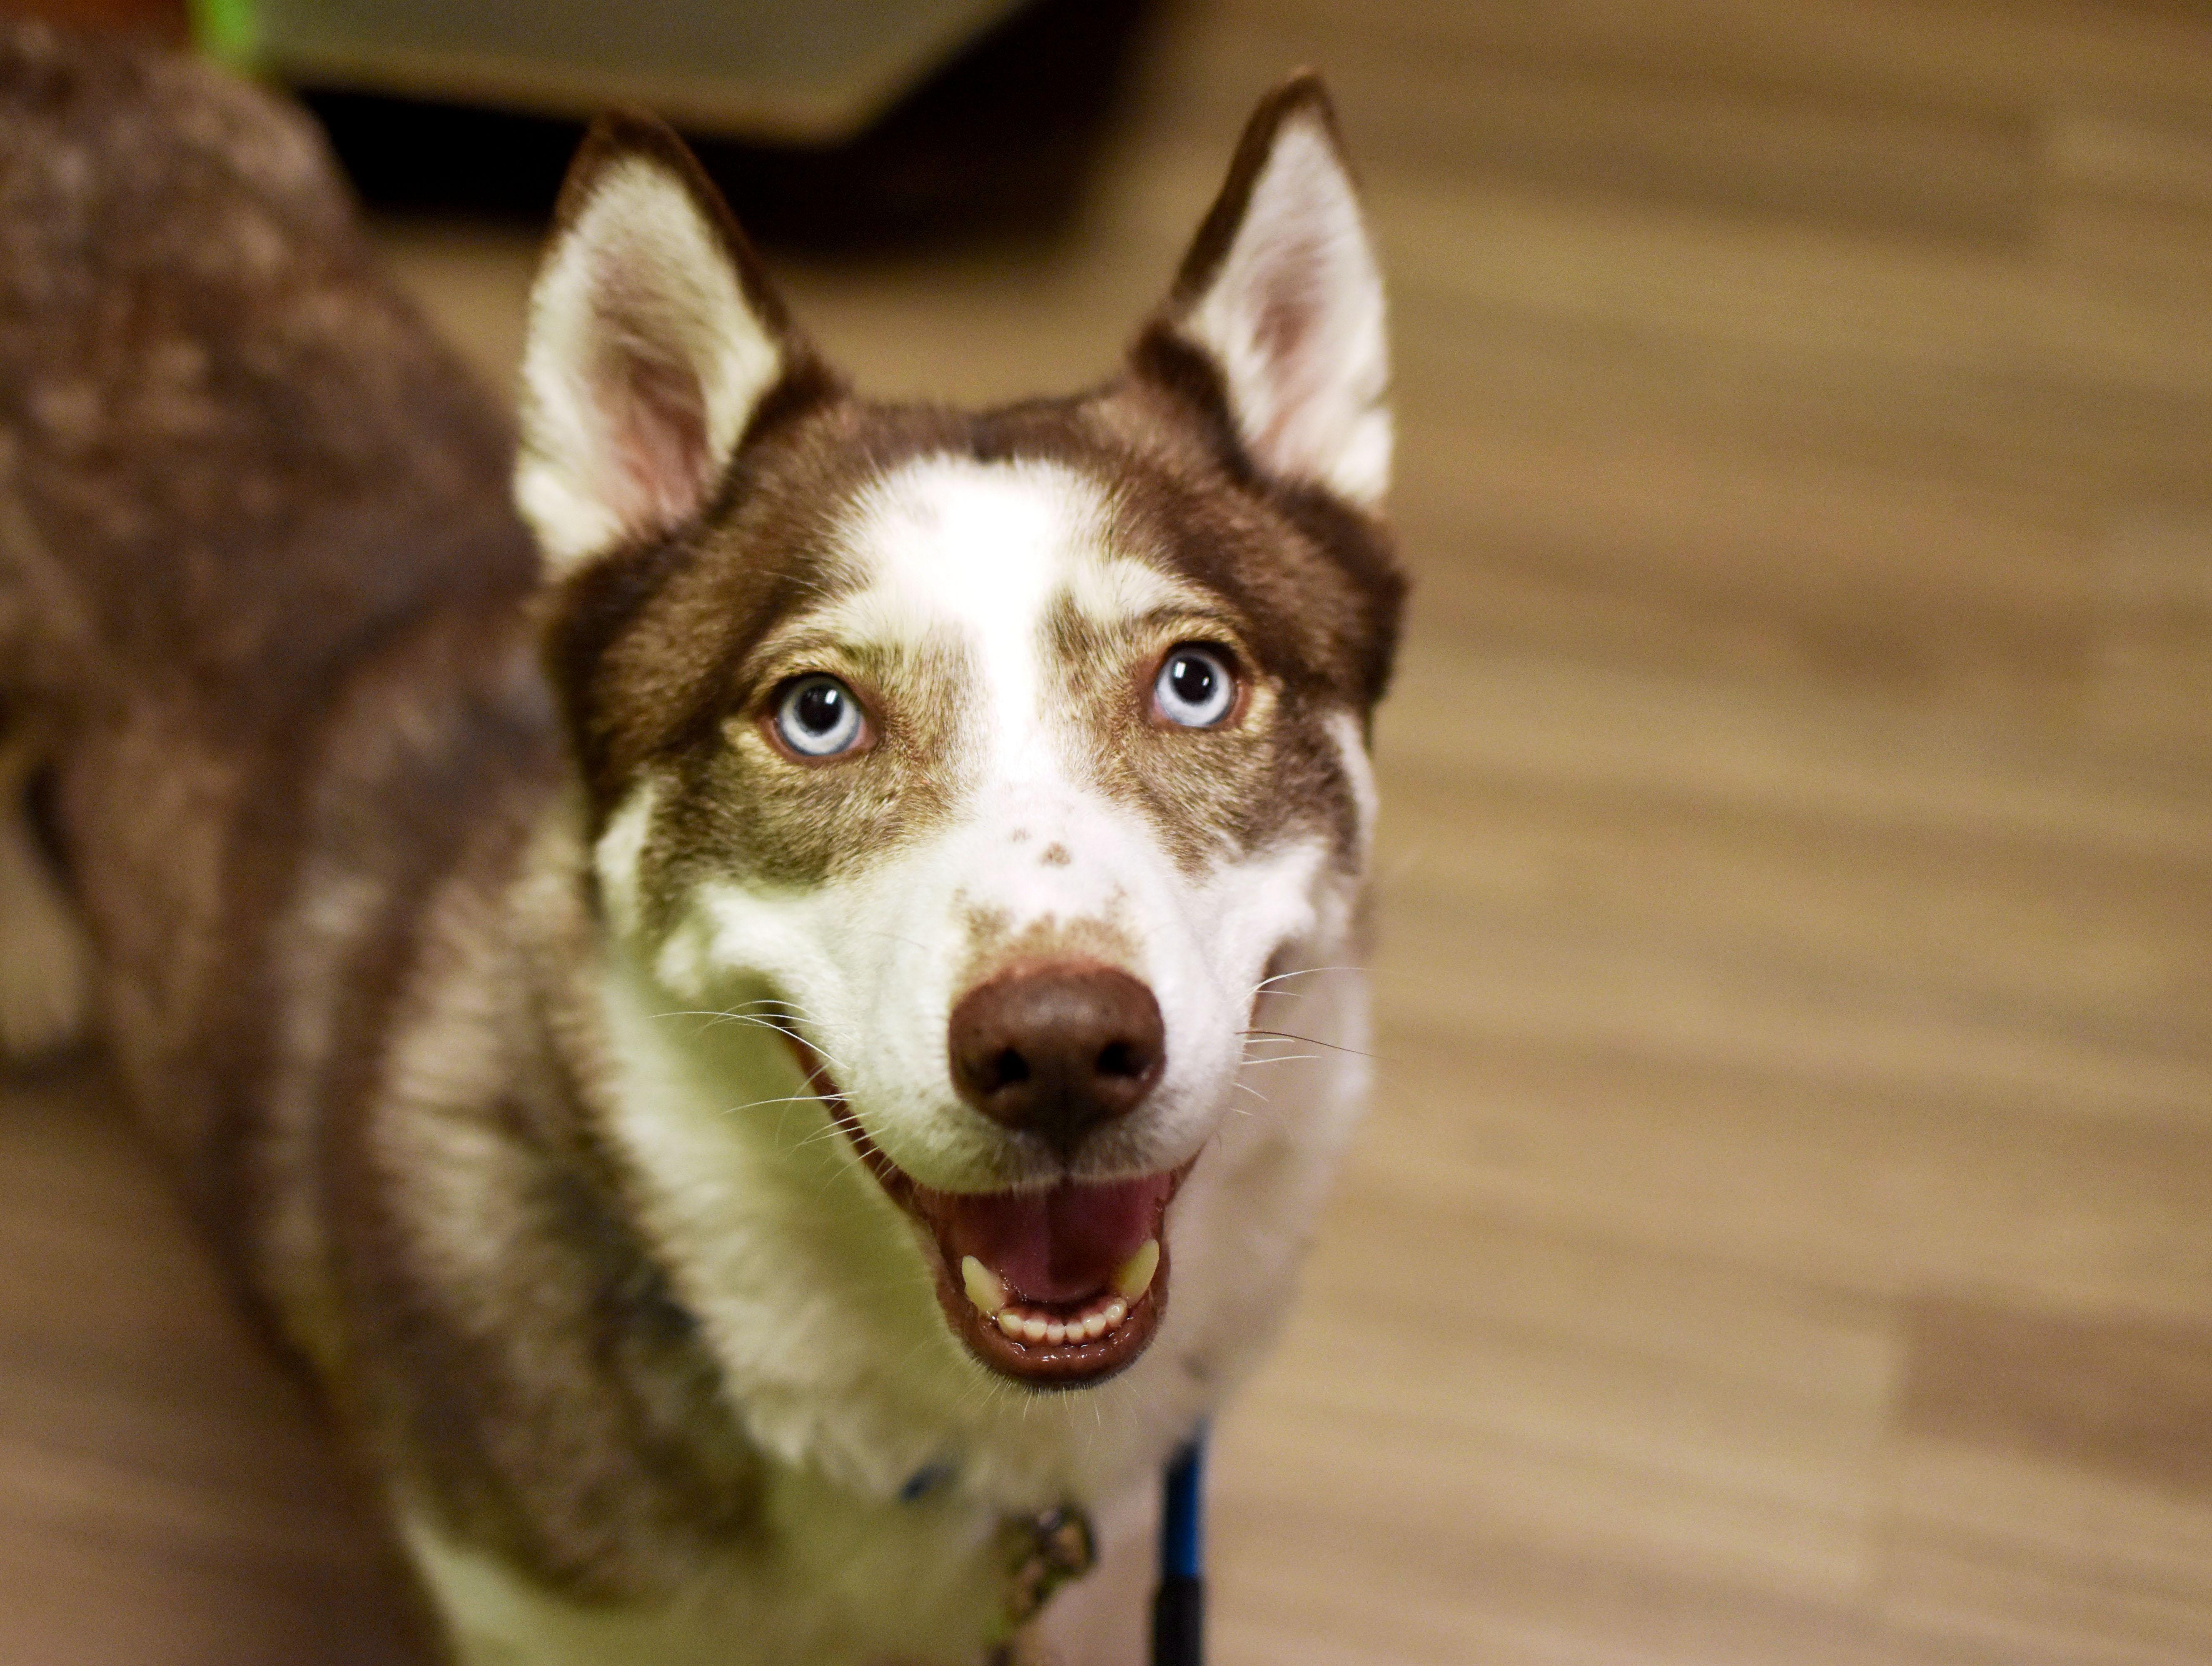 Adopt a Dog - Upper Peninsula Animal Welfare Shelter